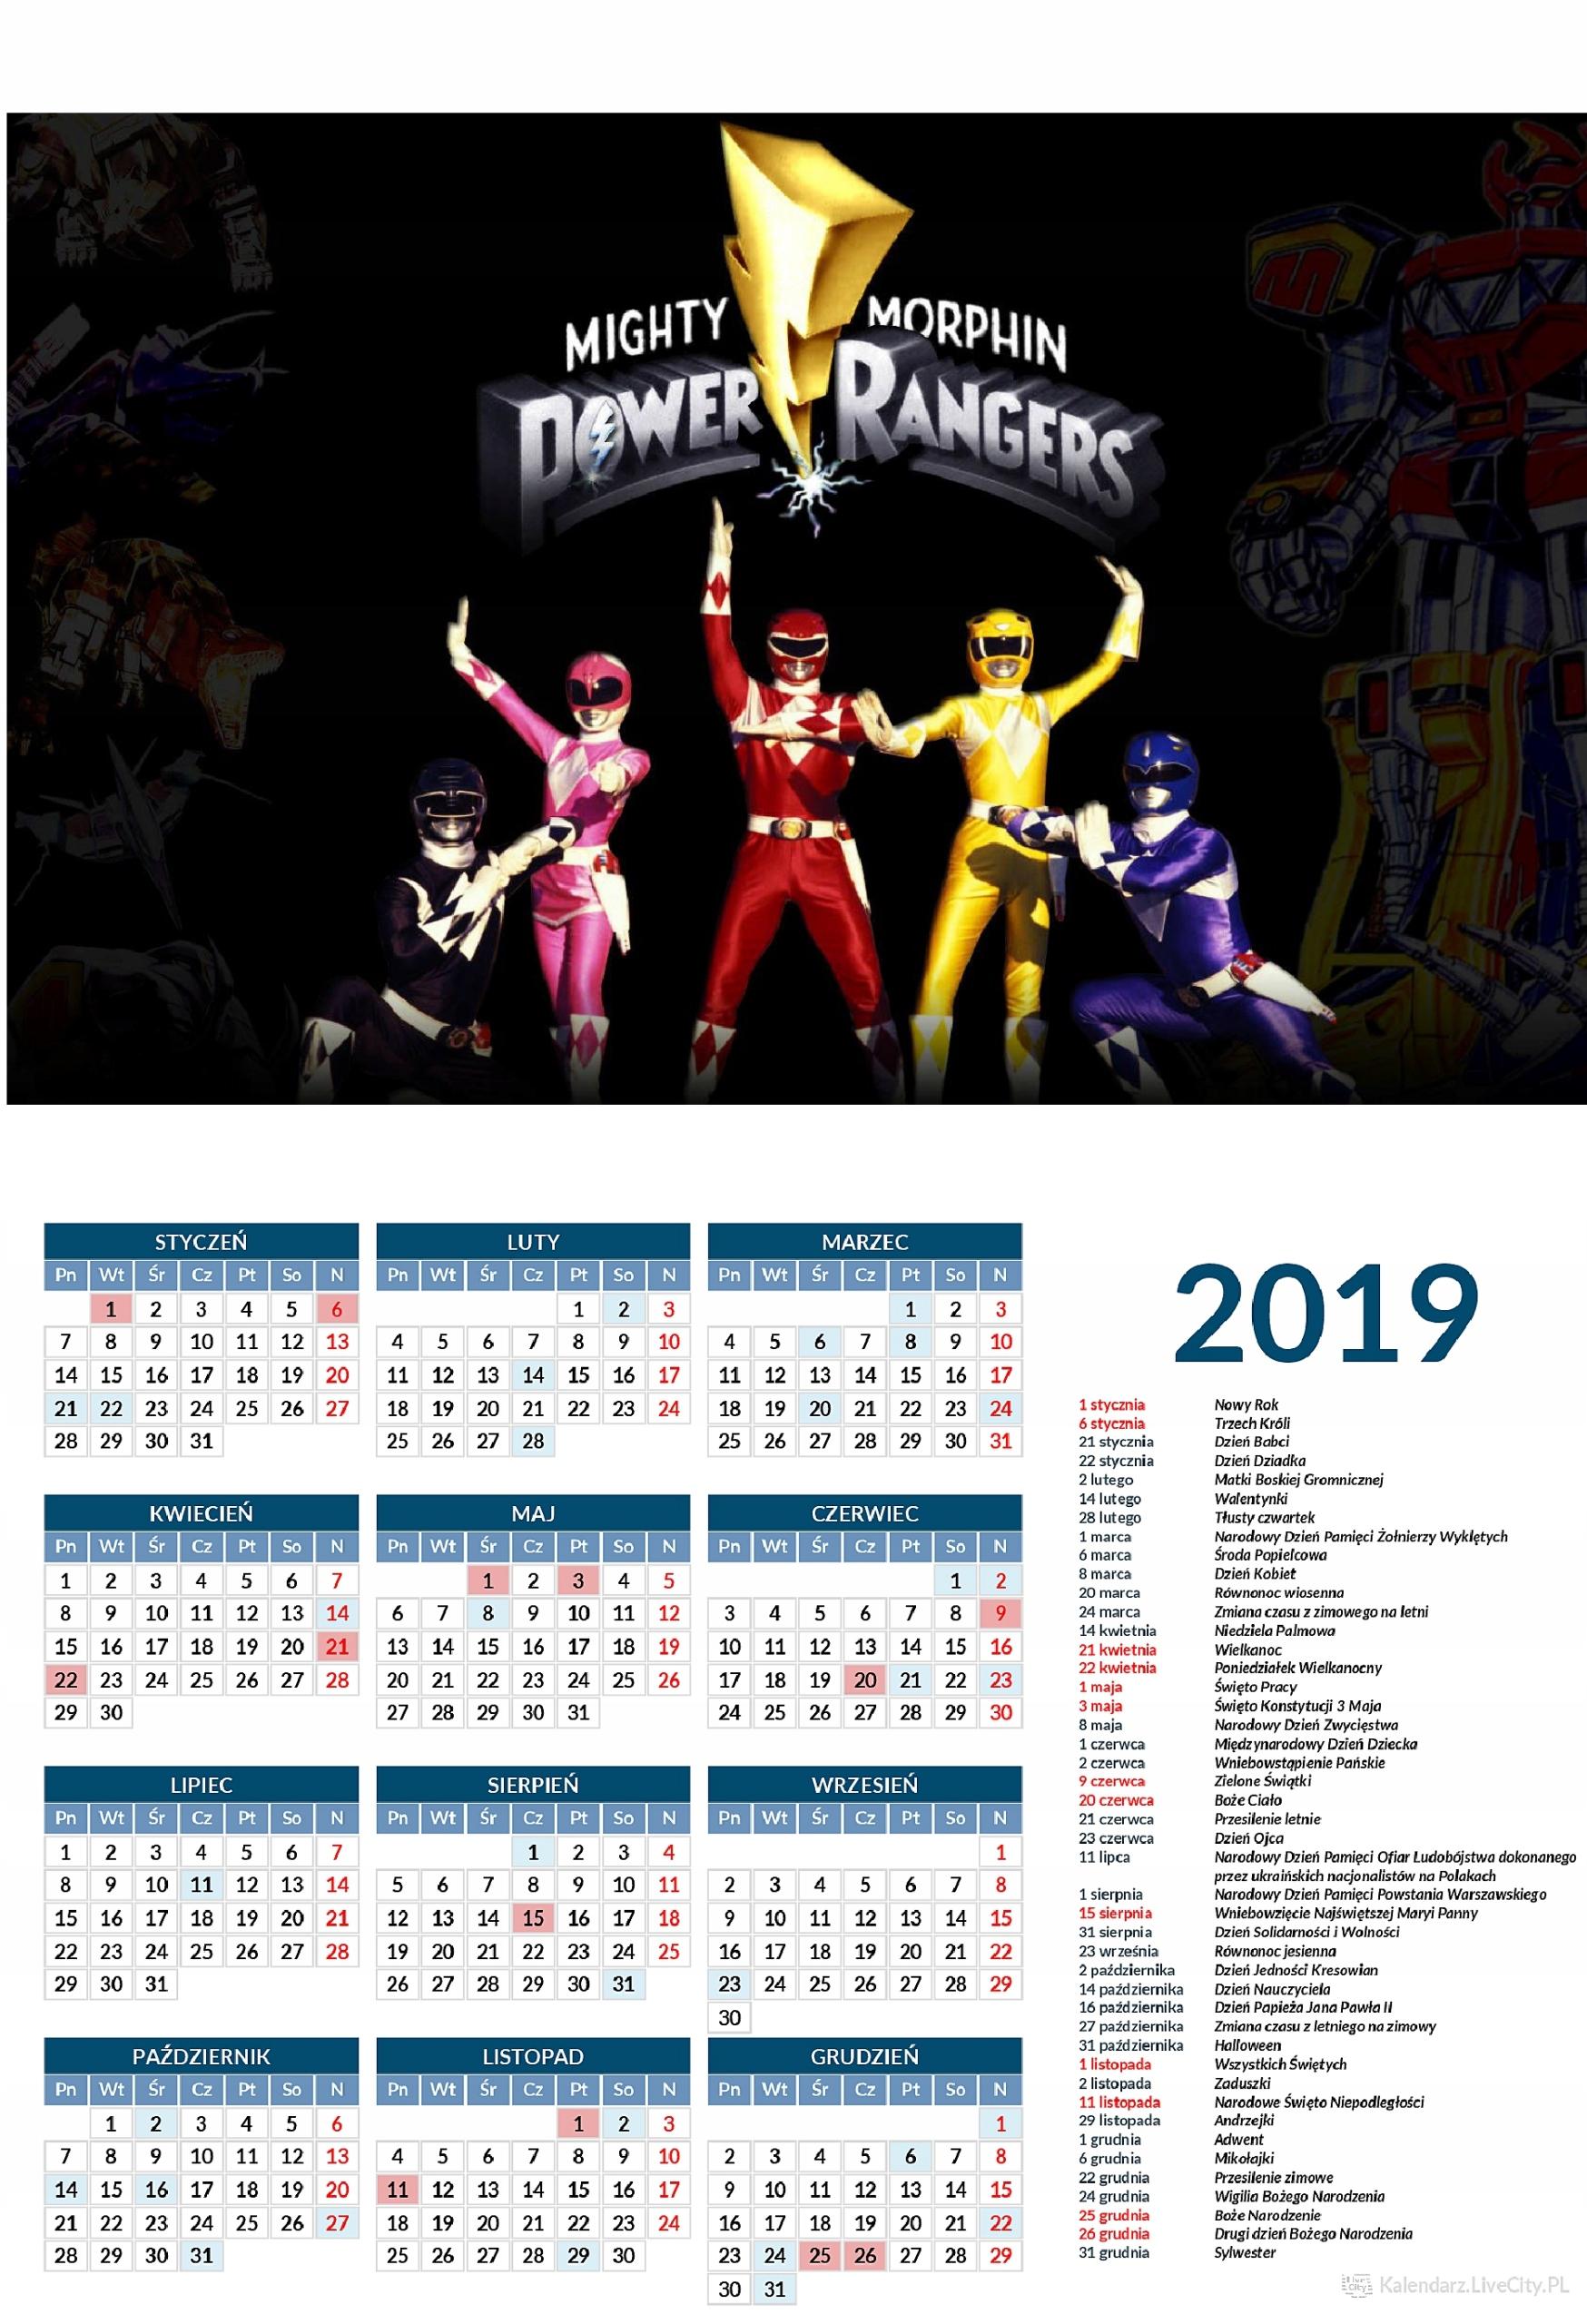 Kalendarz 2019 GRA POWER RANGERS MIGHTY POWER